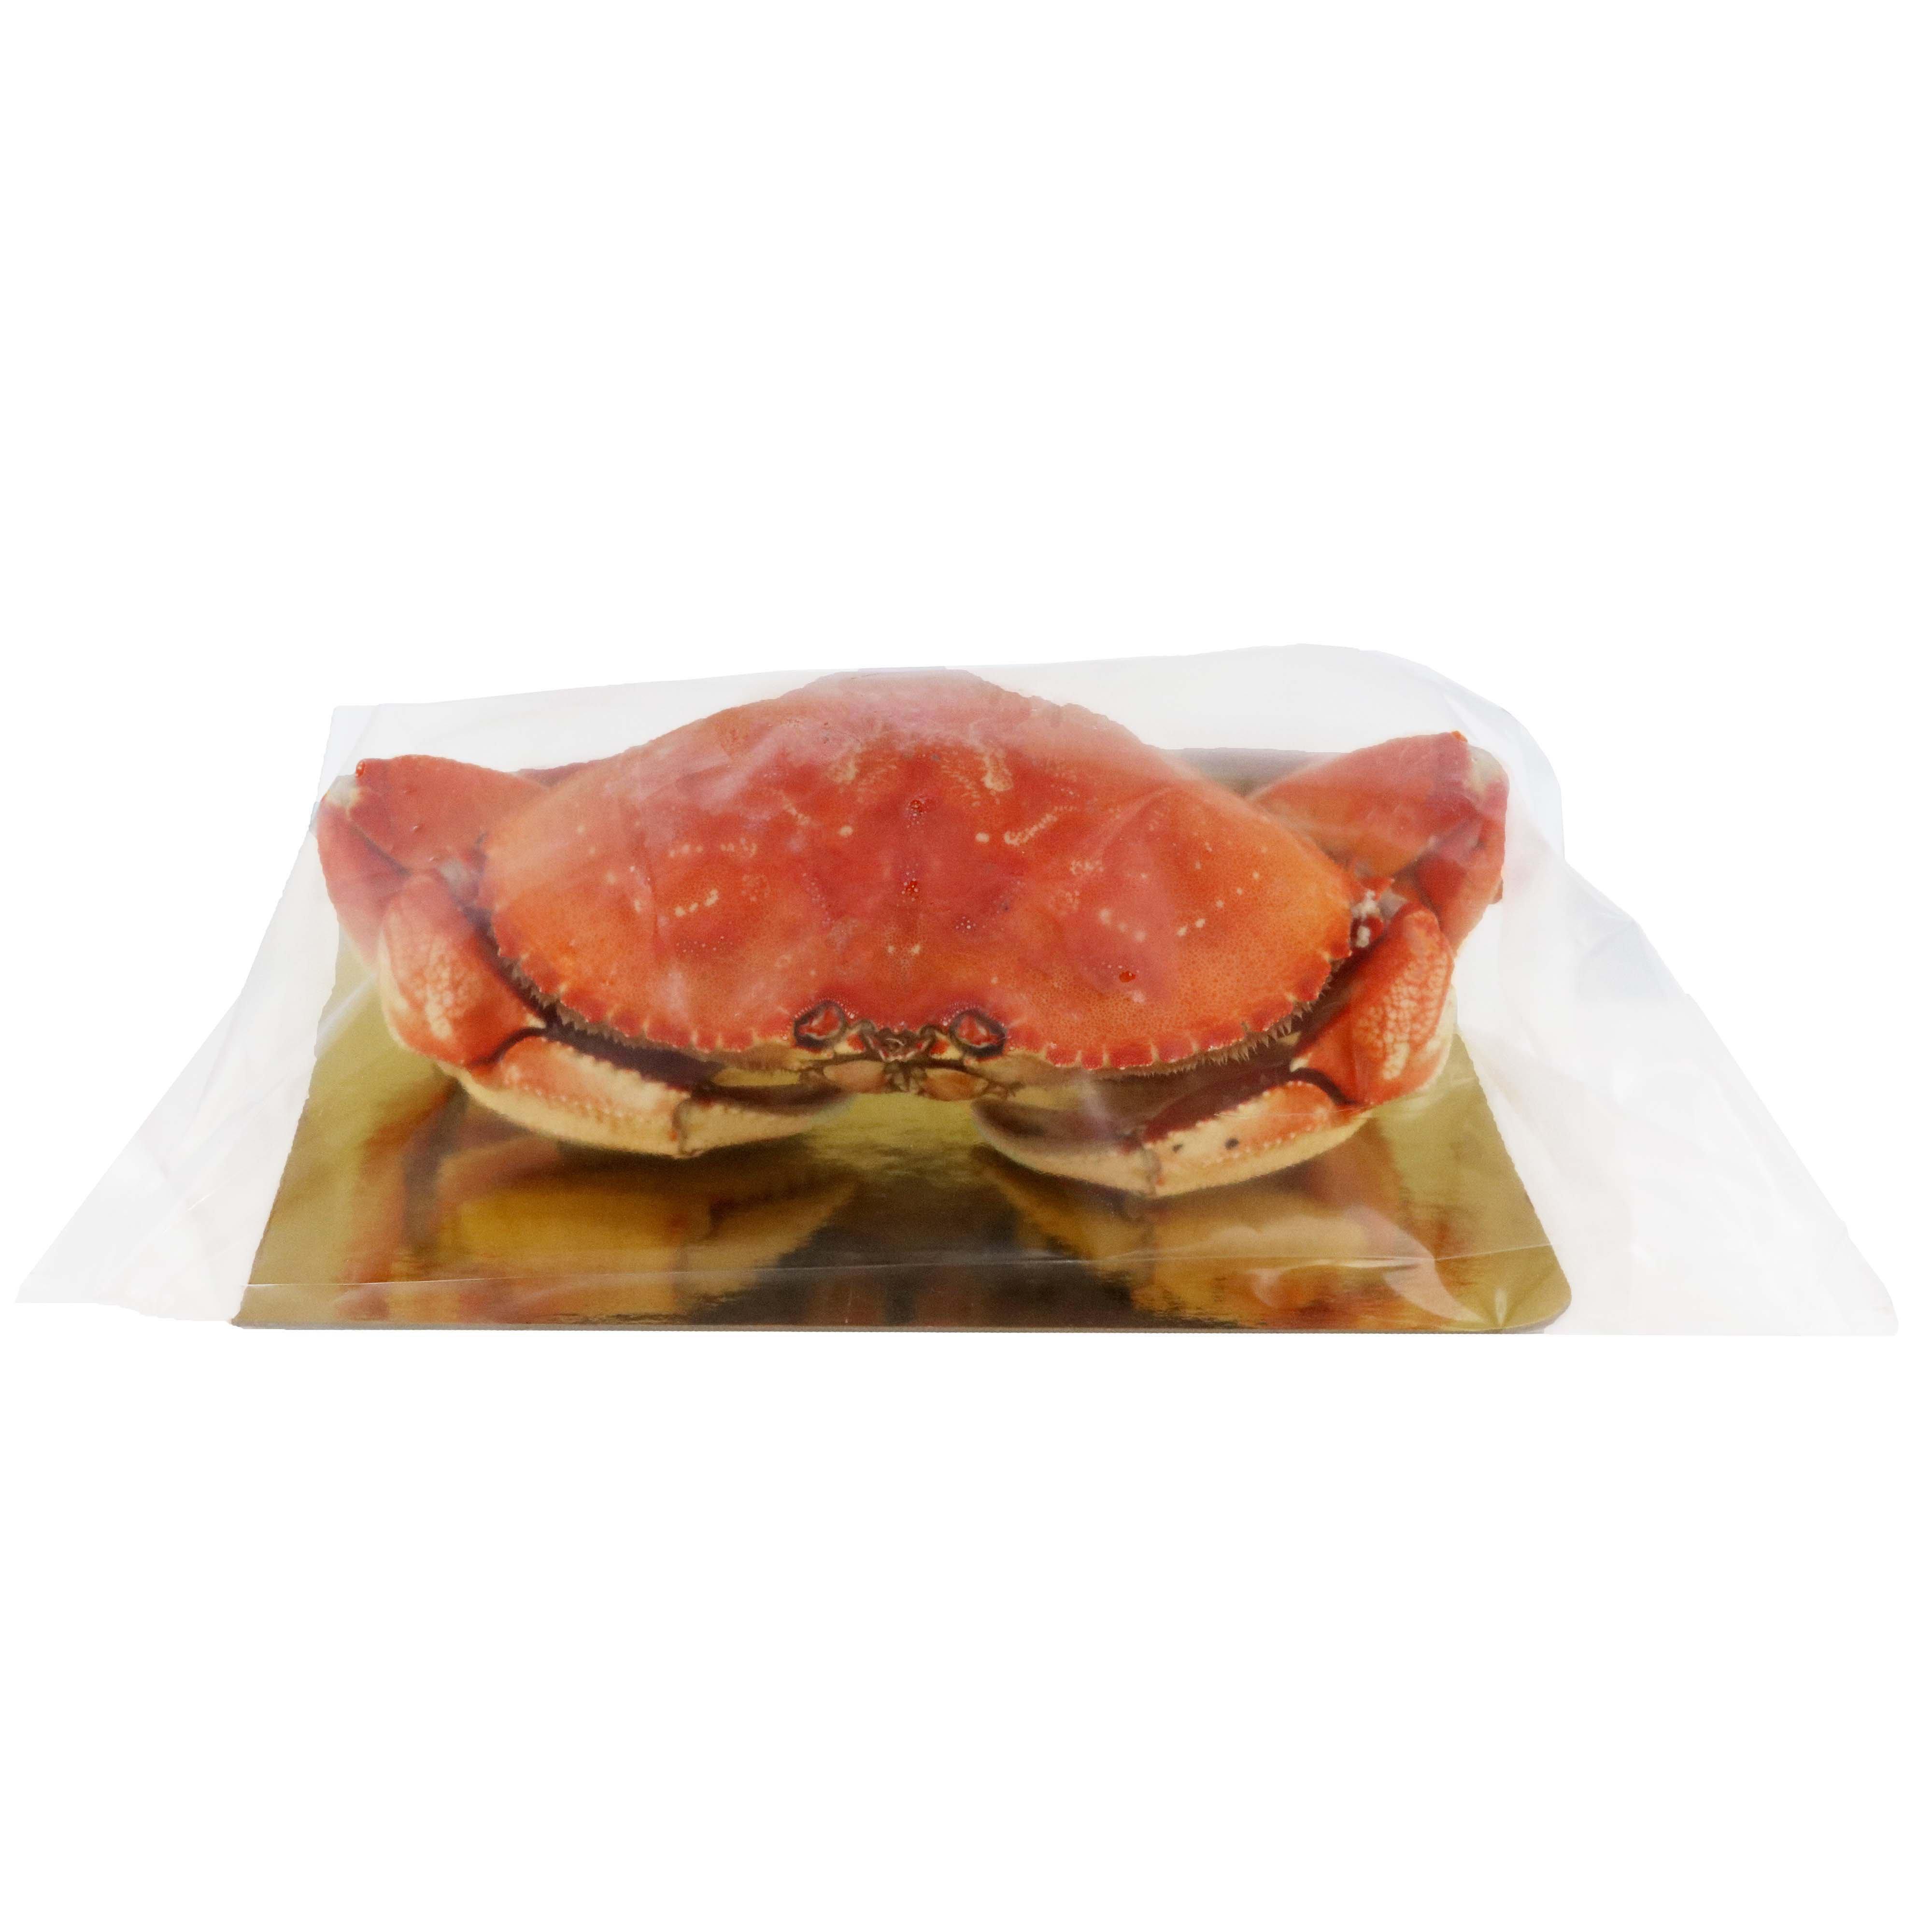 H E B Wild Cooked Whole Dungeness Crab Royal Pack Shop Shrimp Shellfish At H E B